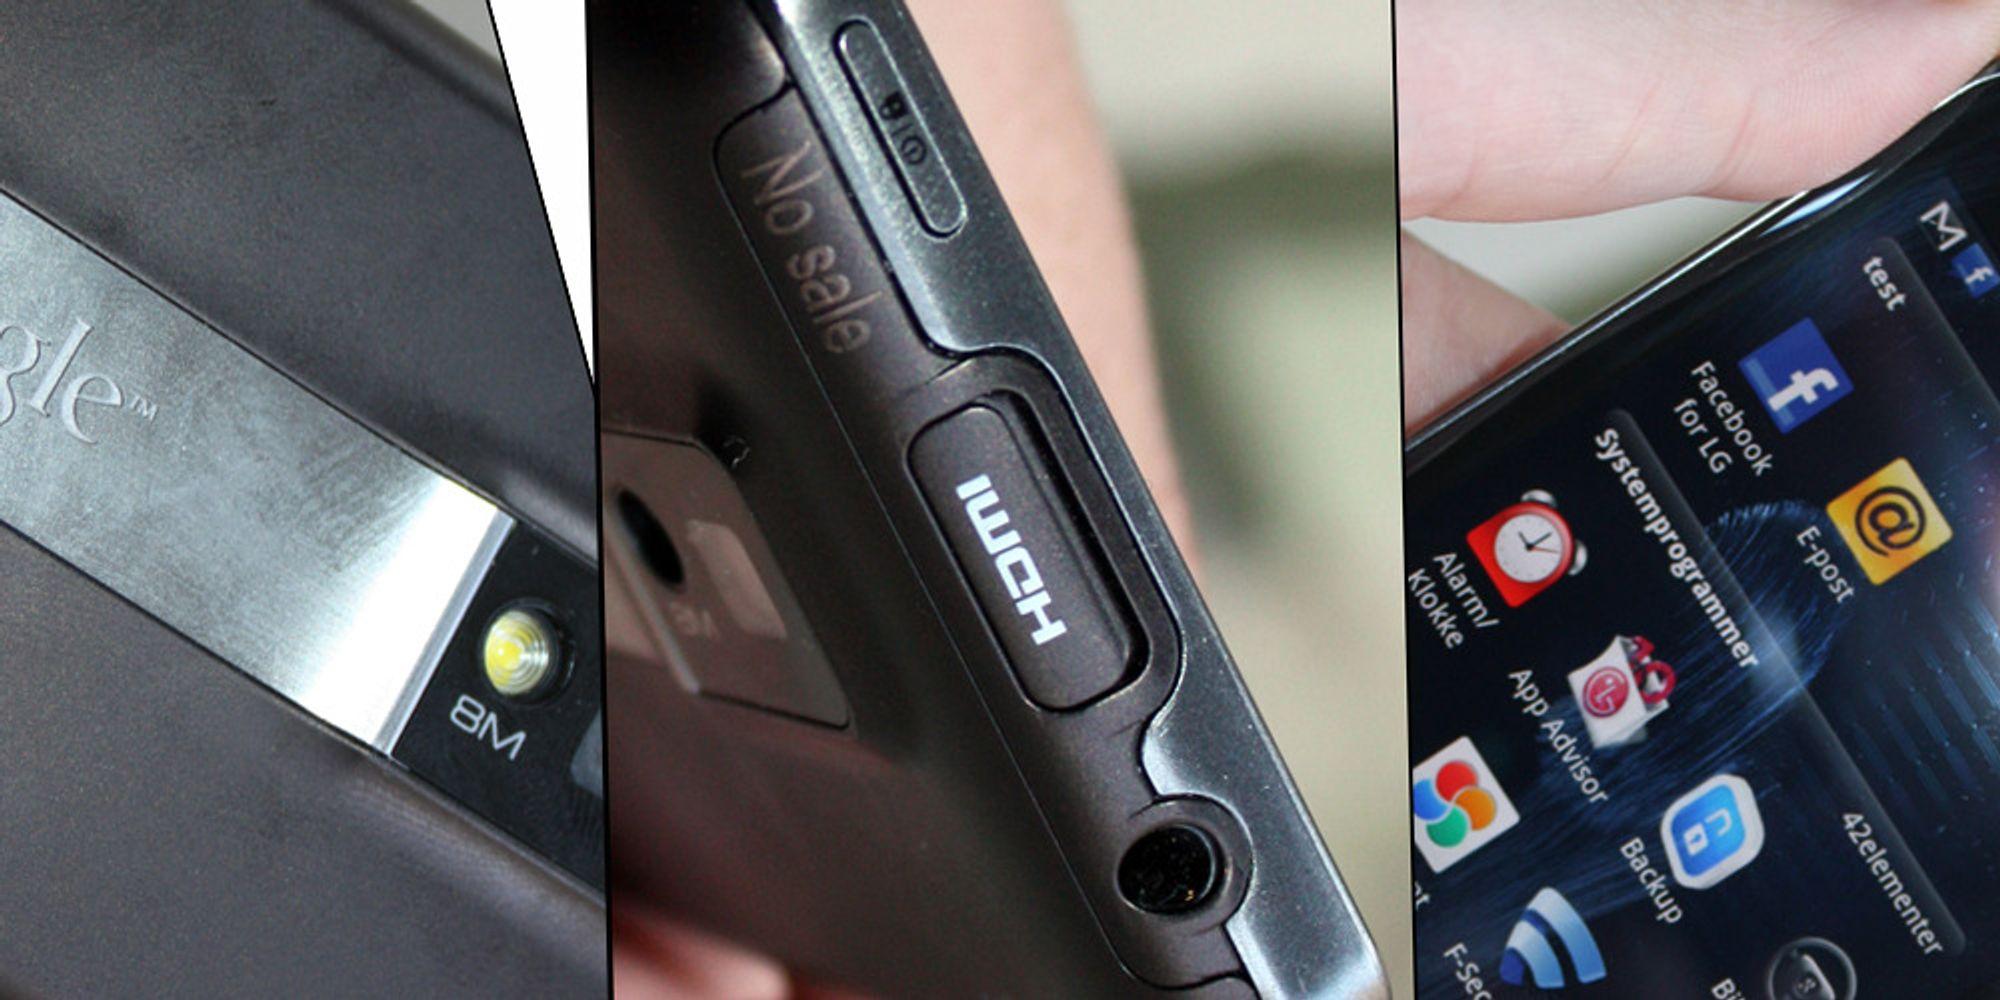 LG Optimus 2X - foreløpig inntrykk